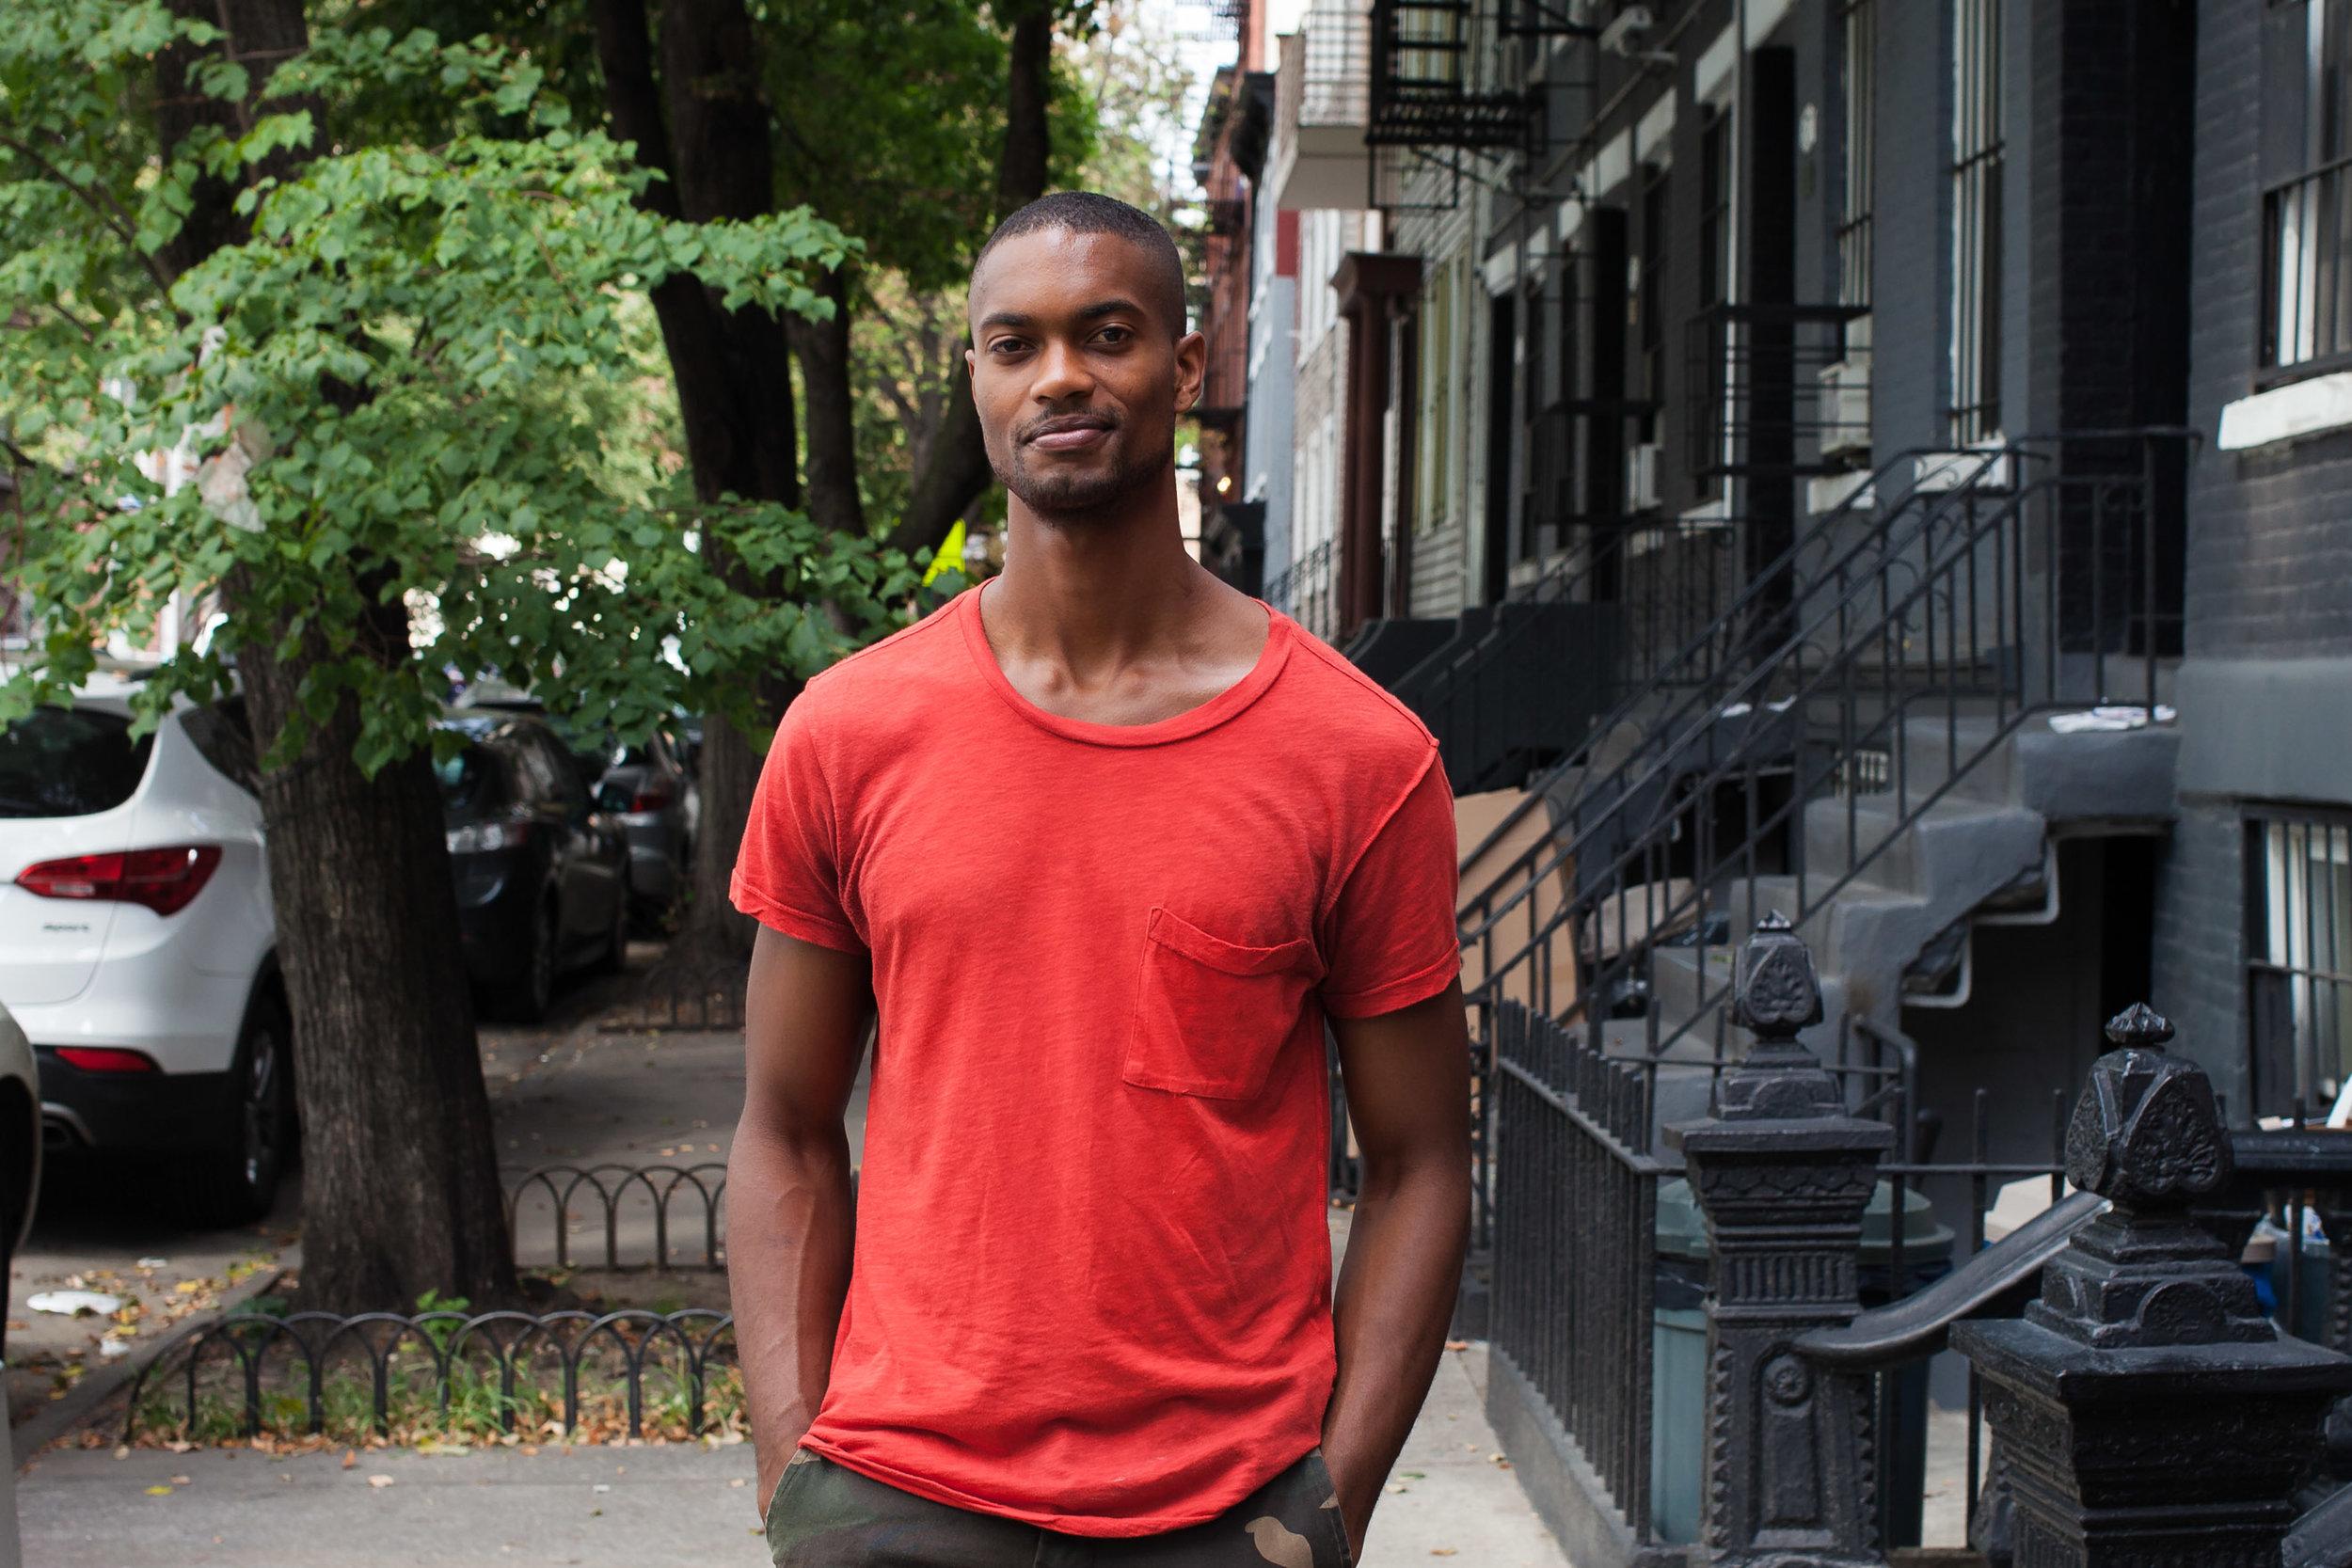 NY_Campaign_NY_Palmer_Brandon_Parker_Portraits_20160909_0074_RET.JPG